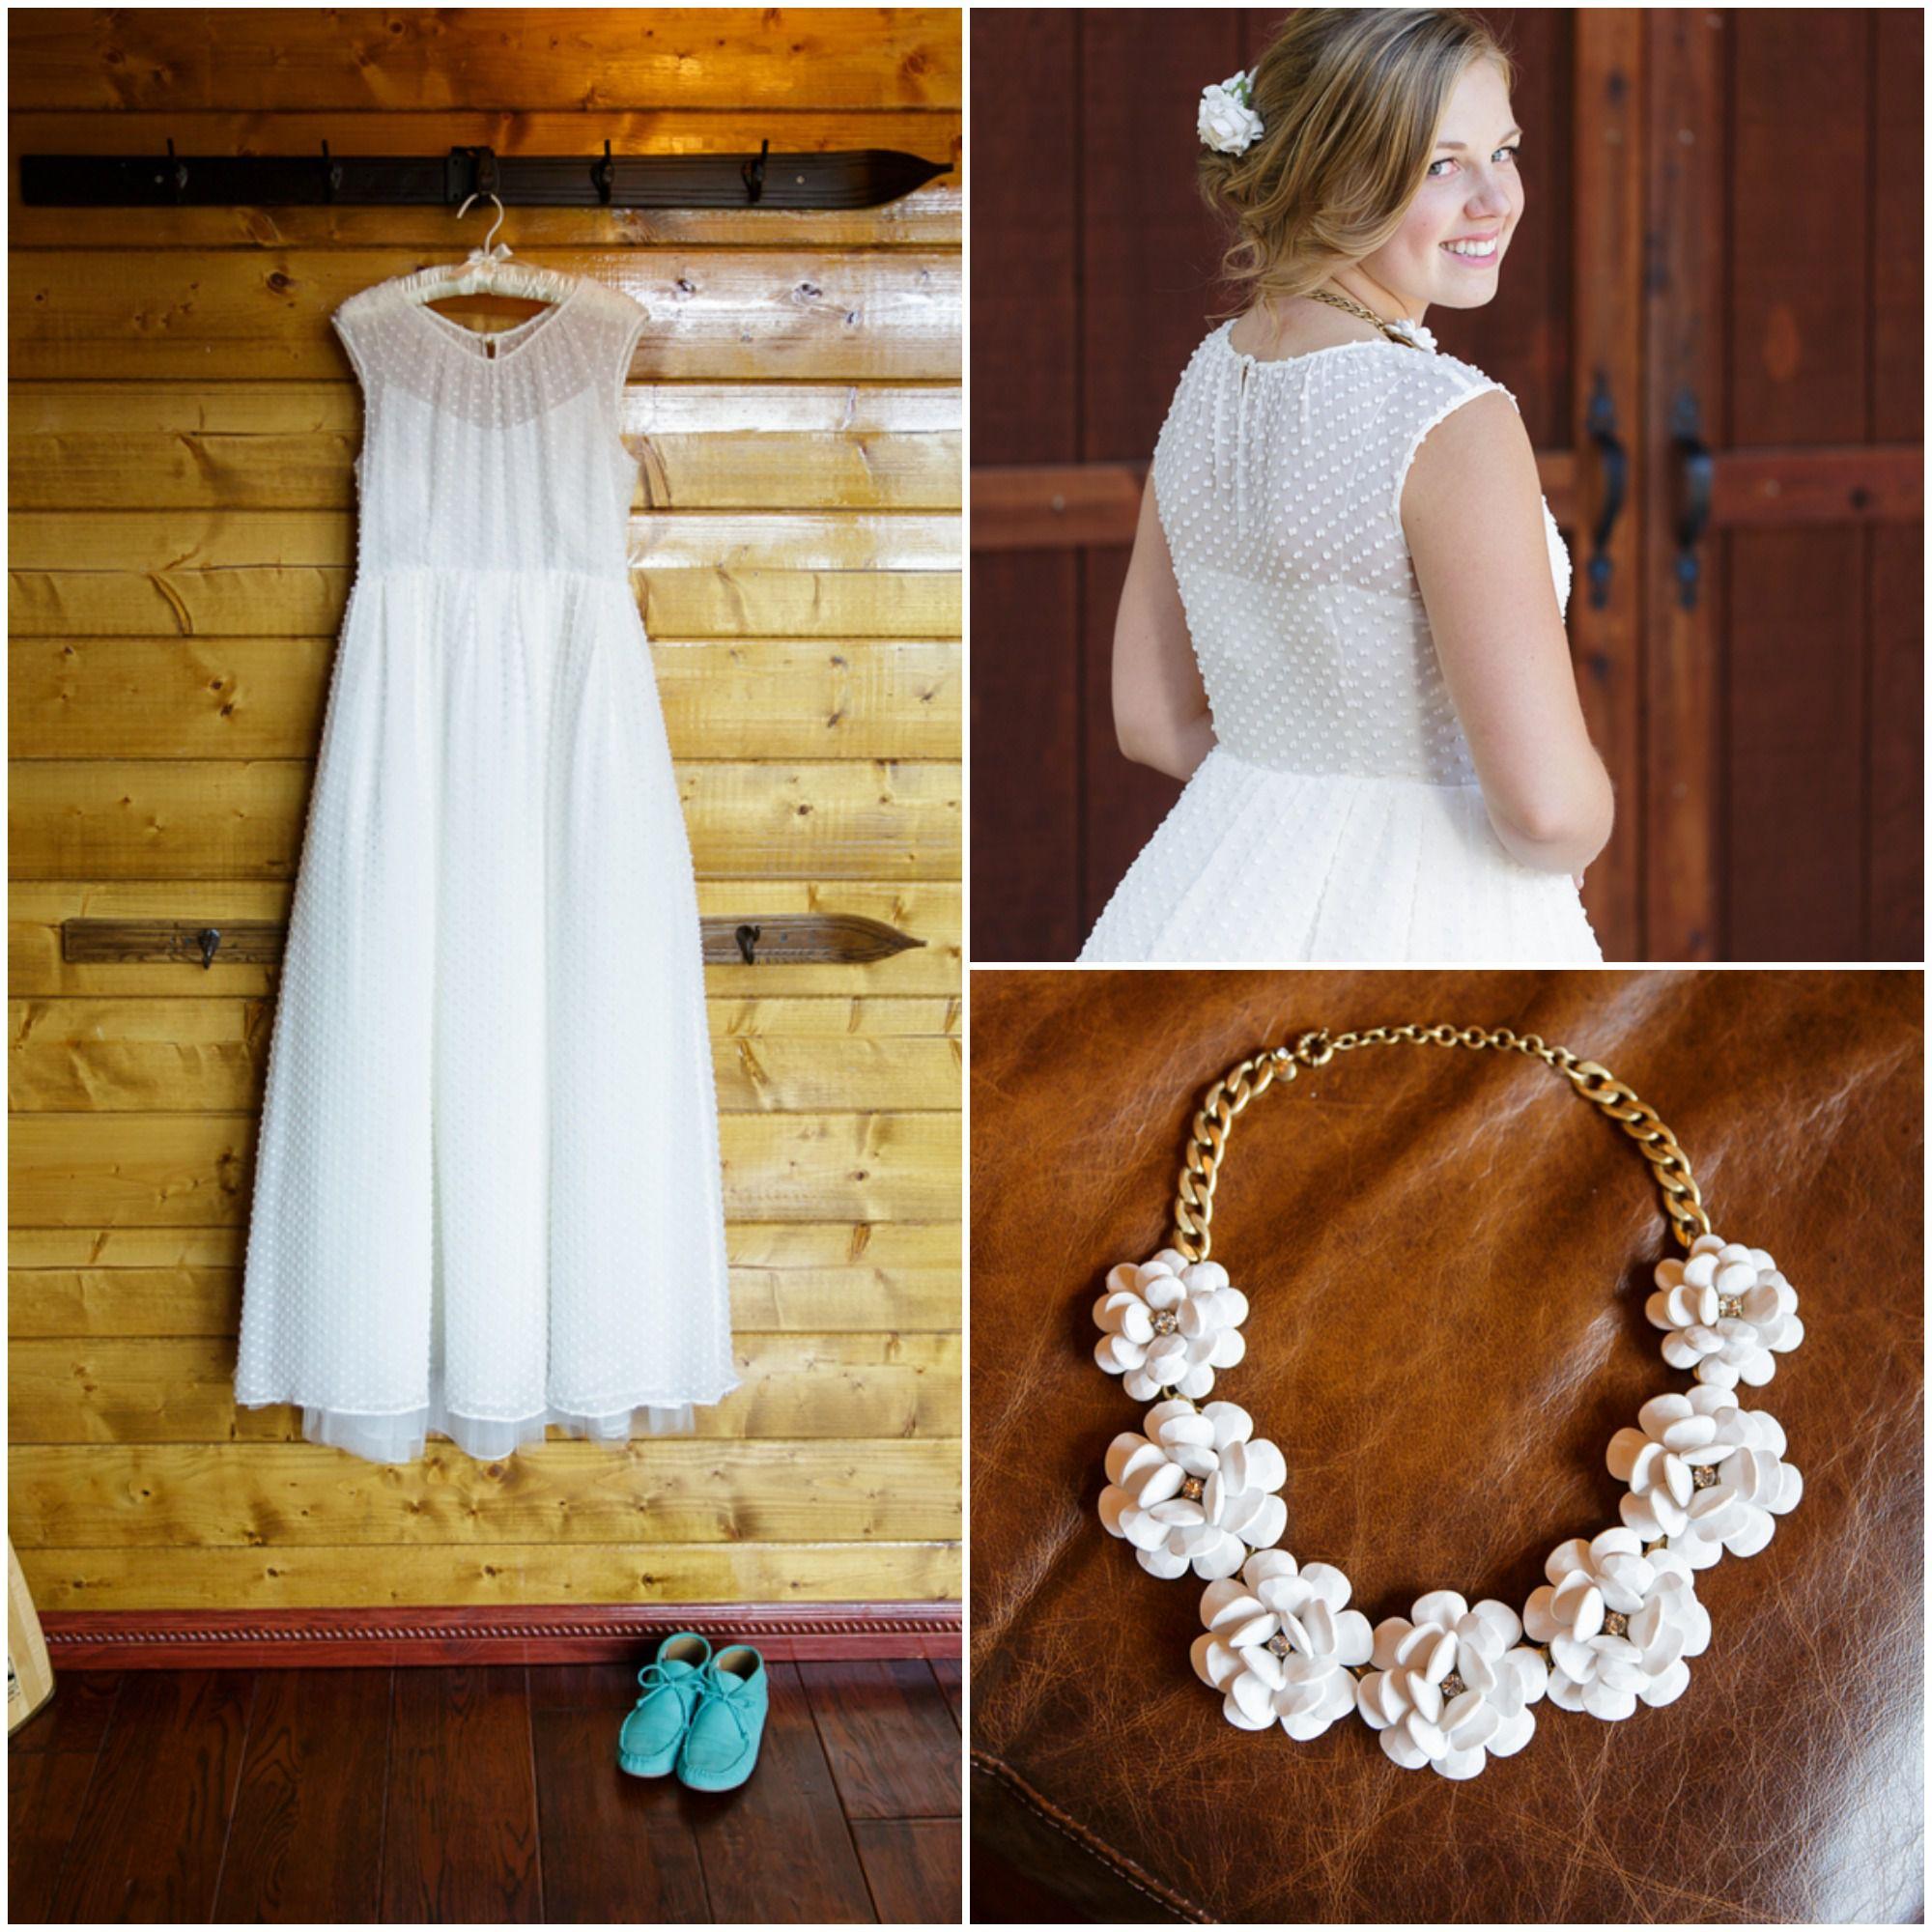 California cabin wedding rustic wedding chic for Dotted swiss wedding dress